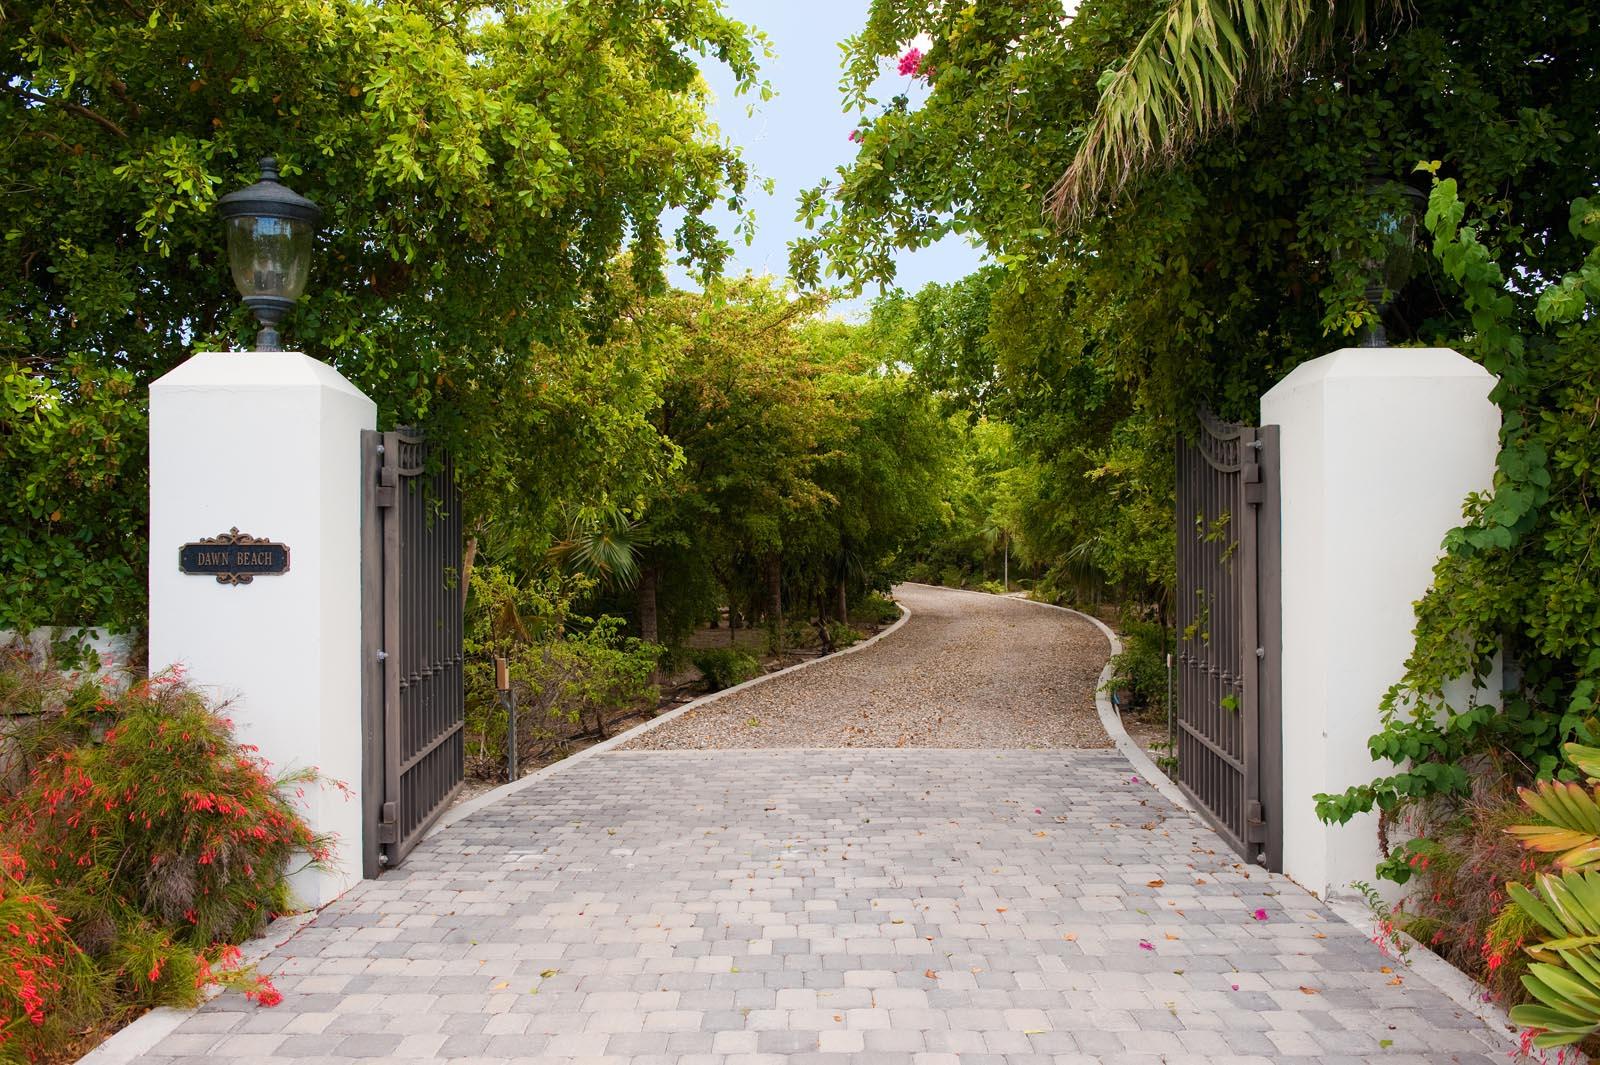 Enter into a very private enclave - Dawn Beach Villa, Grace Bay Beach, Providenciales (Provo), Turks and Caicos Islands.